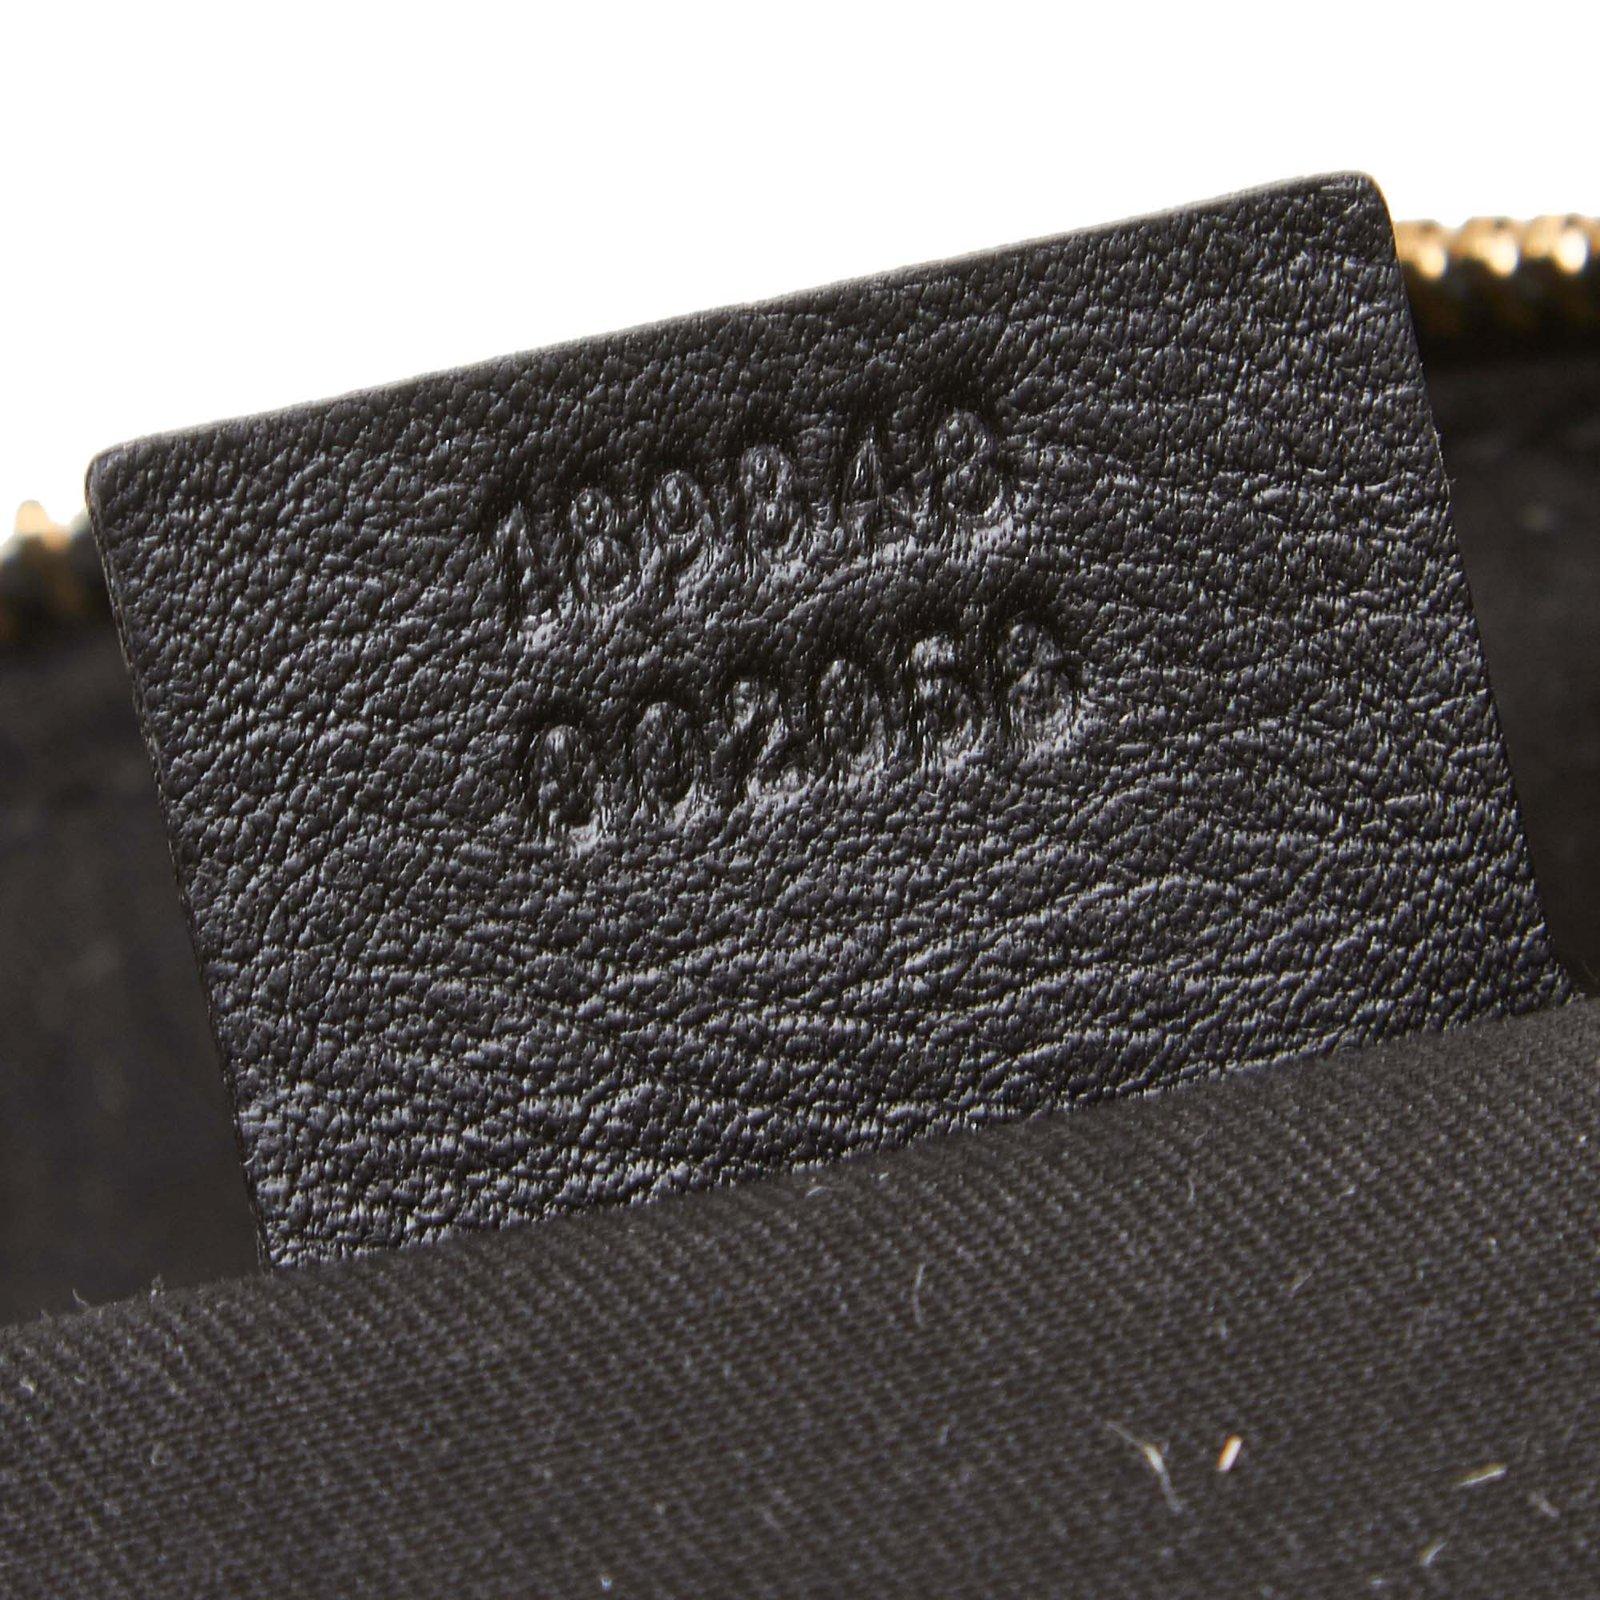 7a52ddb65ef2 Gucci Leather Sabrina Shoulder Bag Handbags Leather,Other Black ref.90304 -  Joli Closet